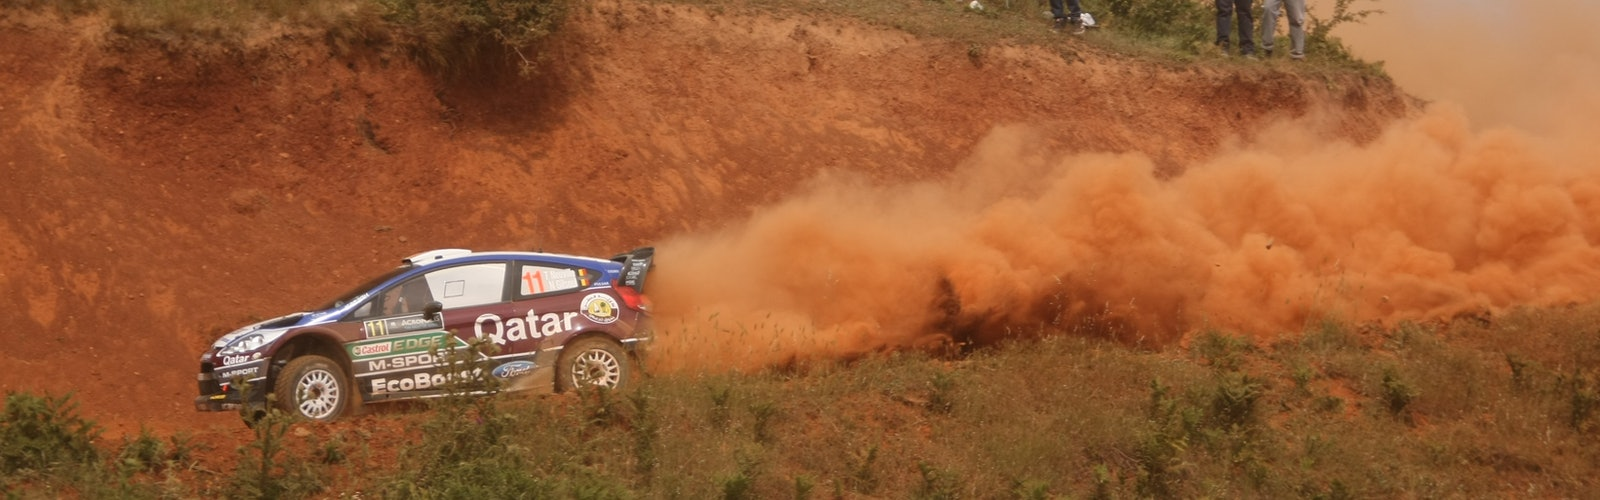 Thierry Neuville Acropolis Rally Greece 2013 6